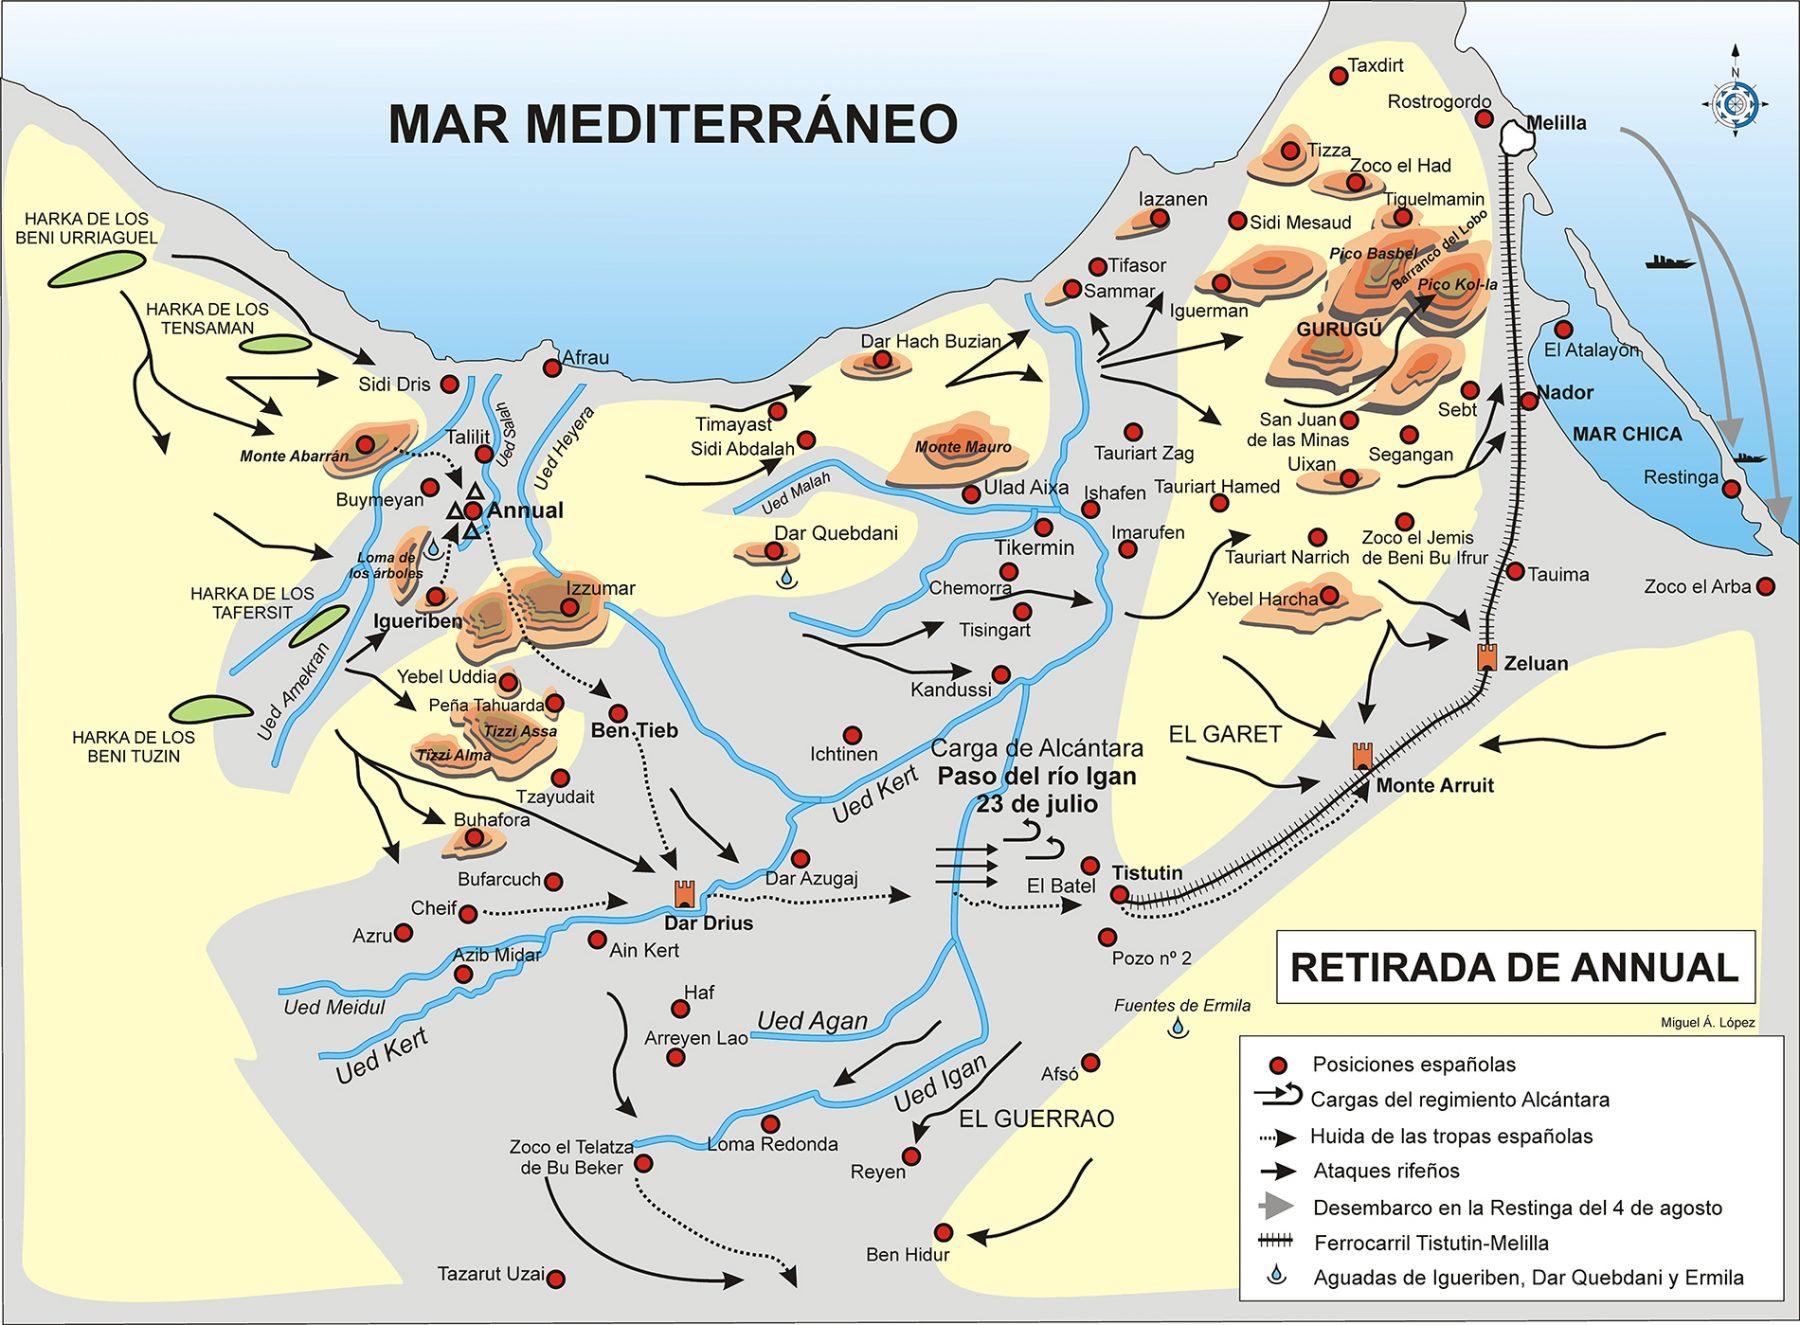 Mapa que muestra la retirada de Annual